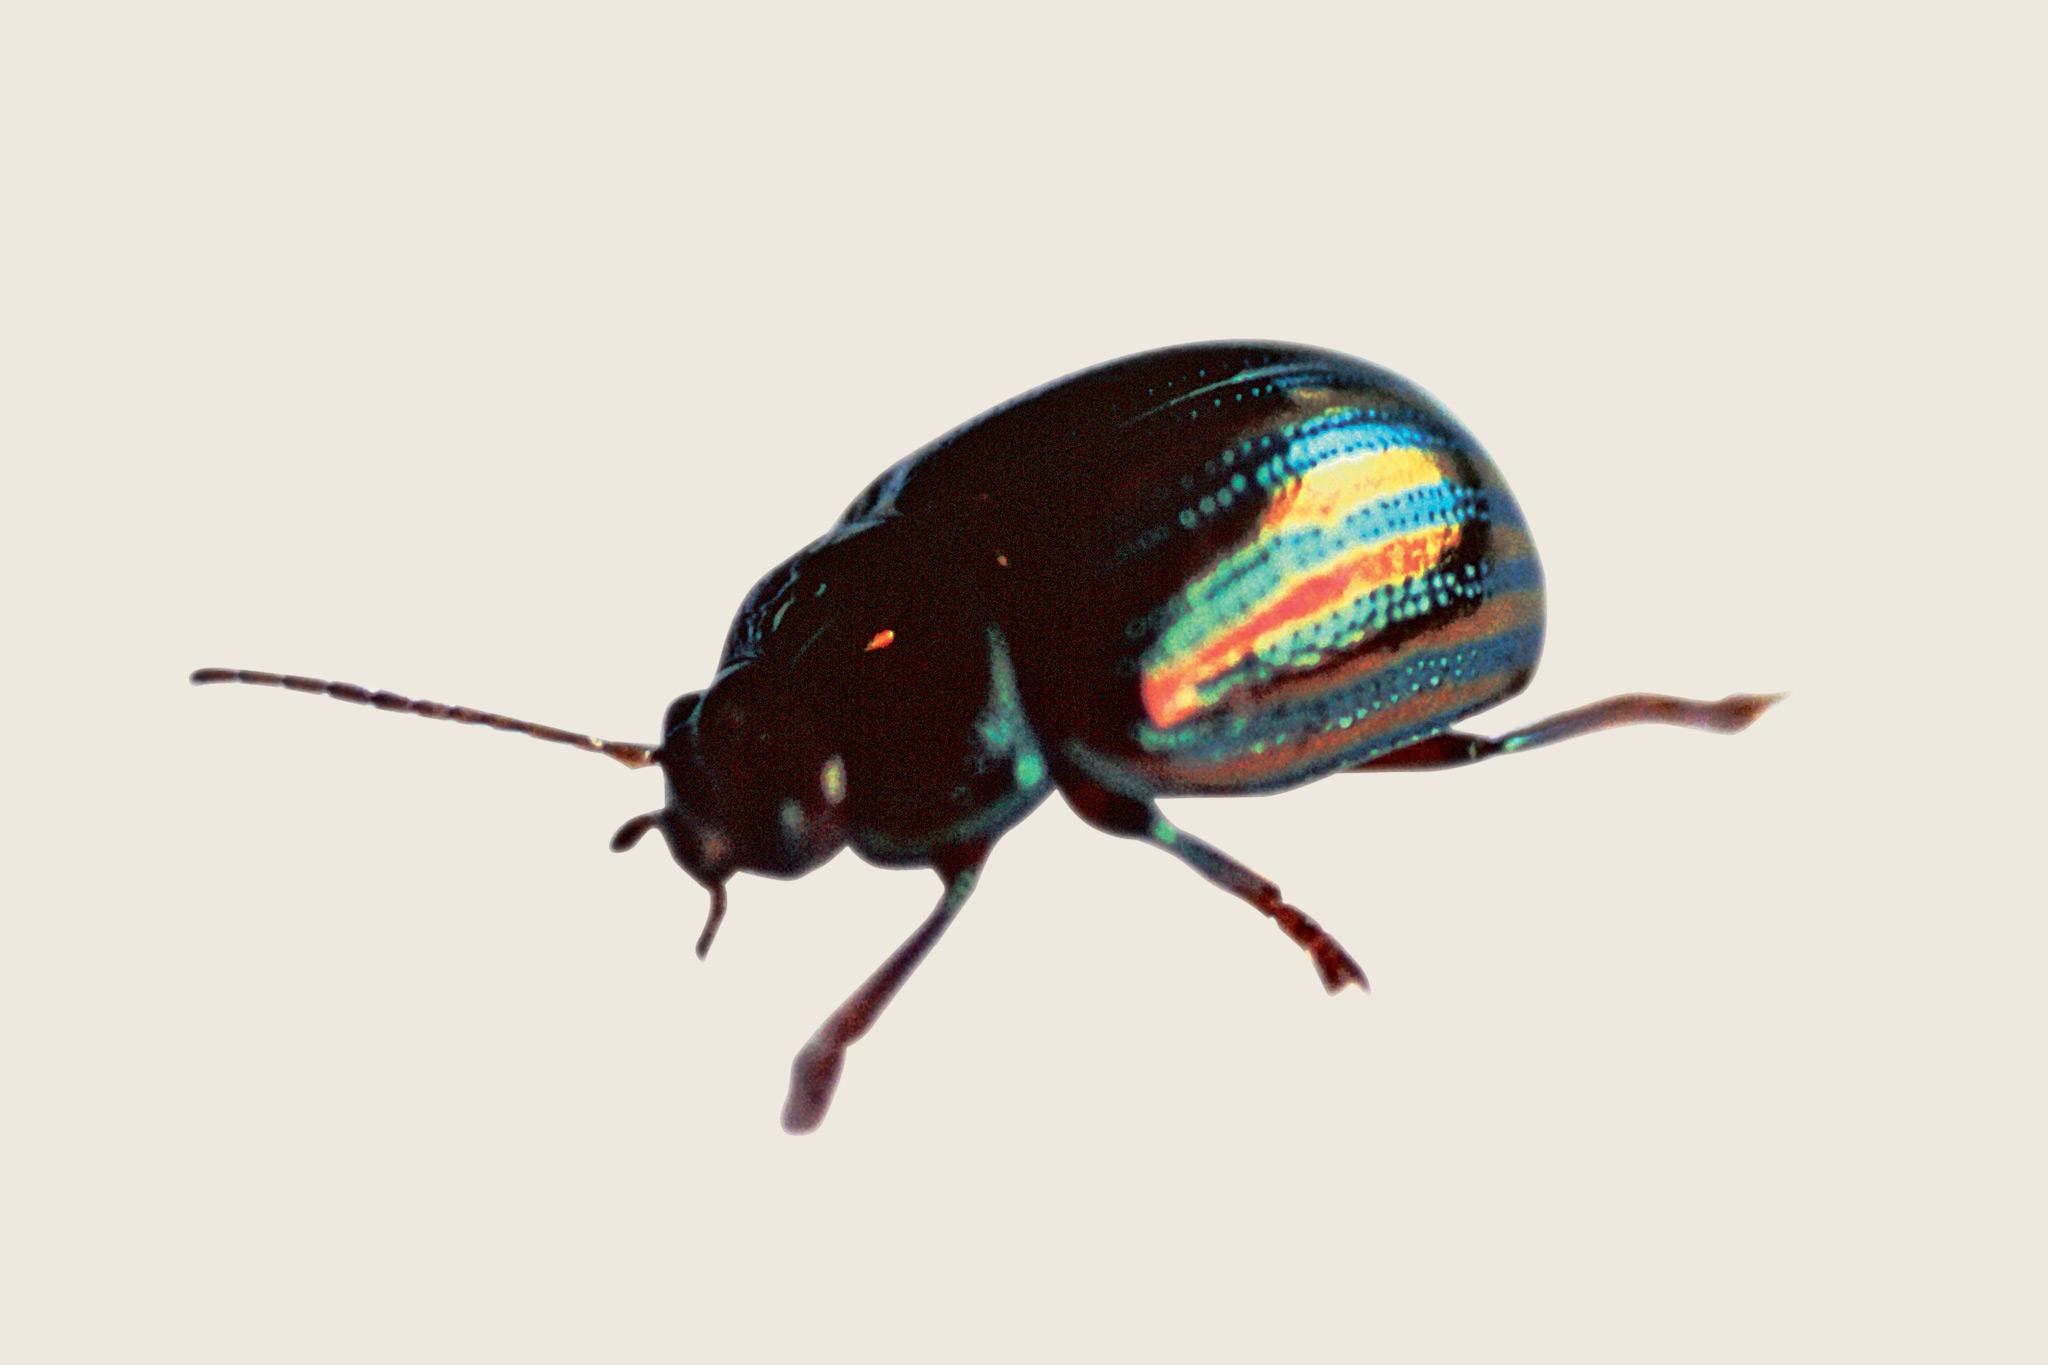 rosemary-beetle-2